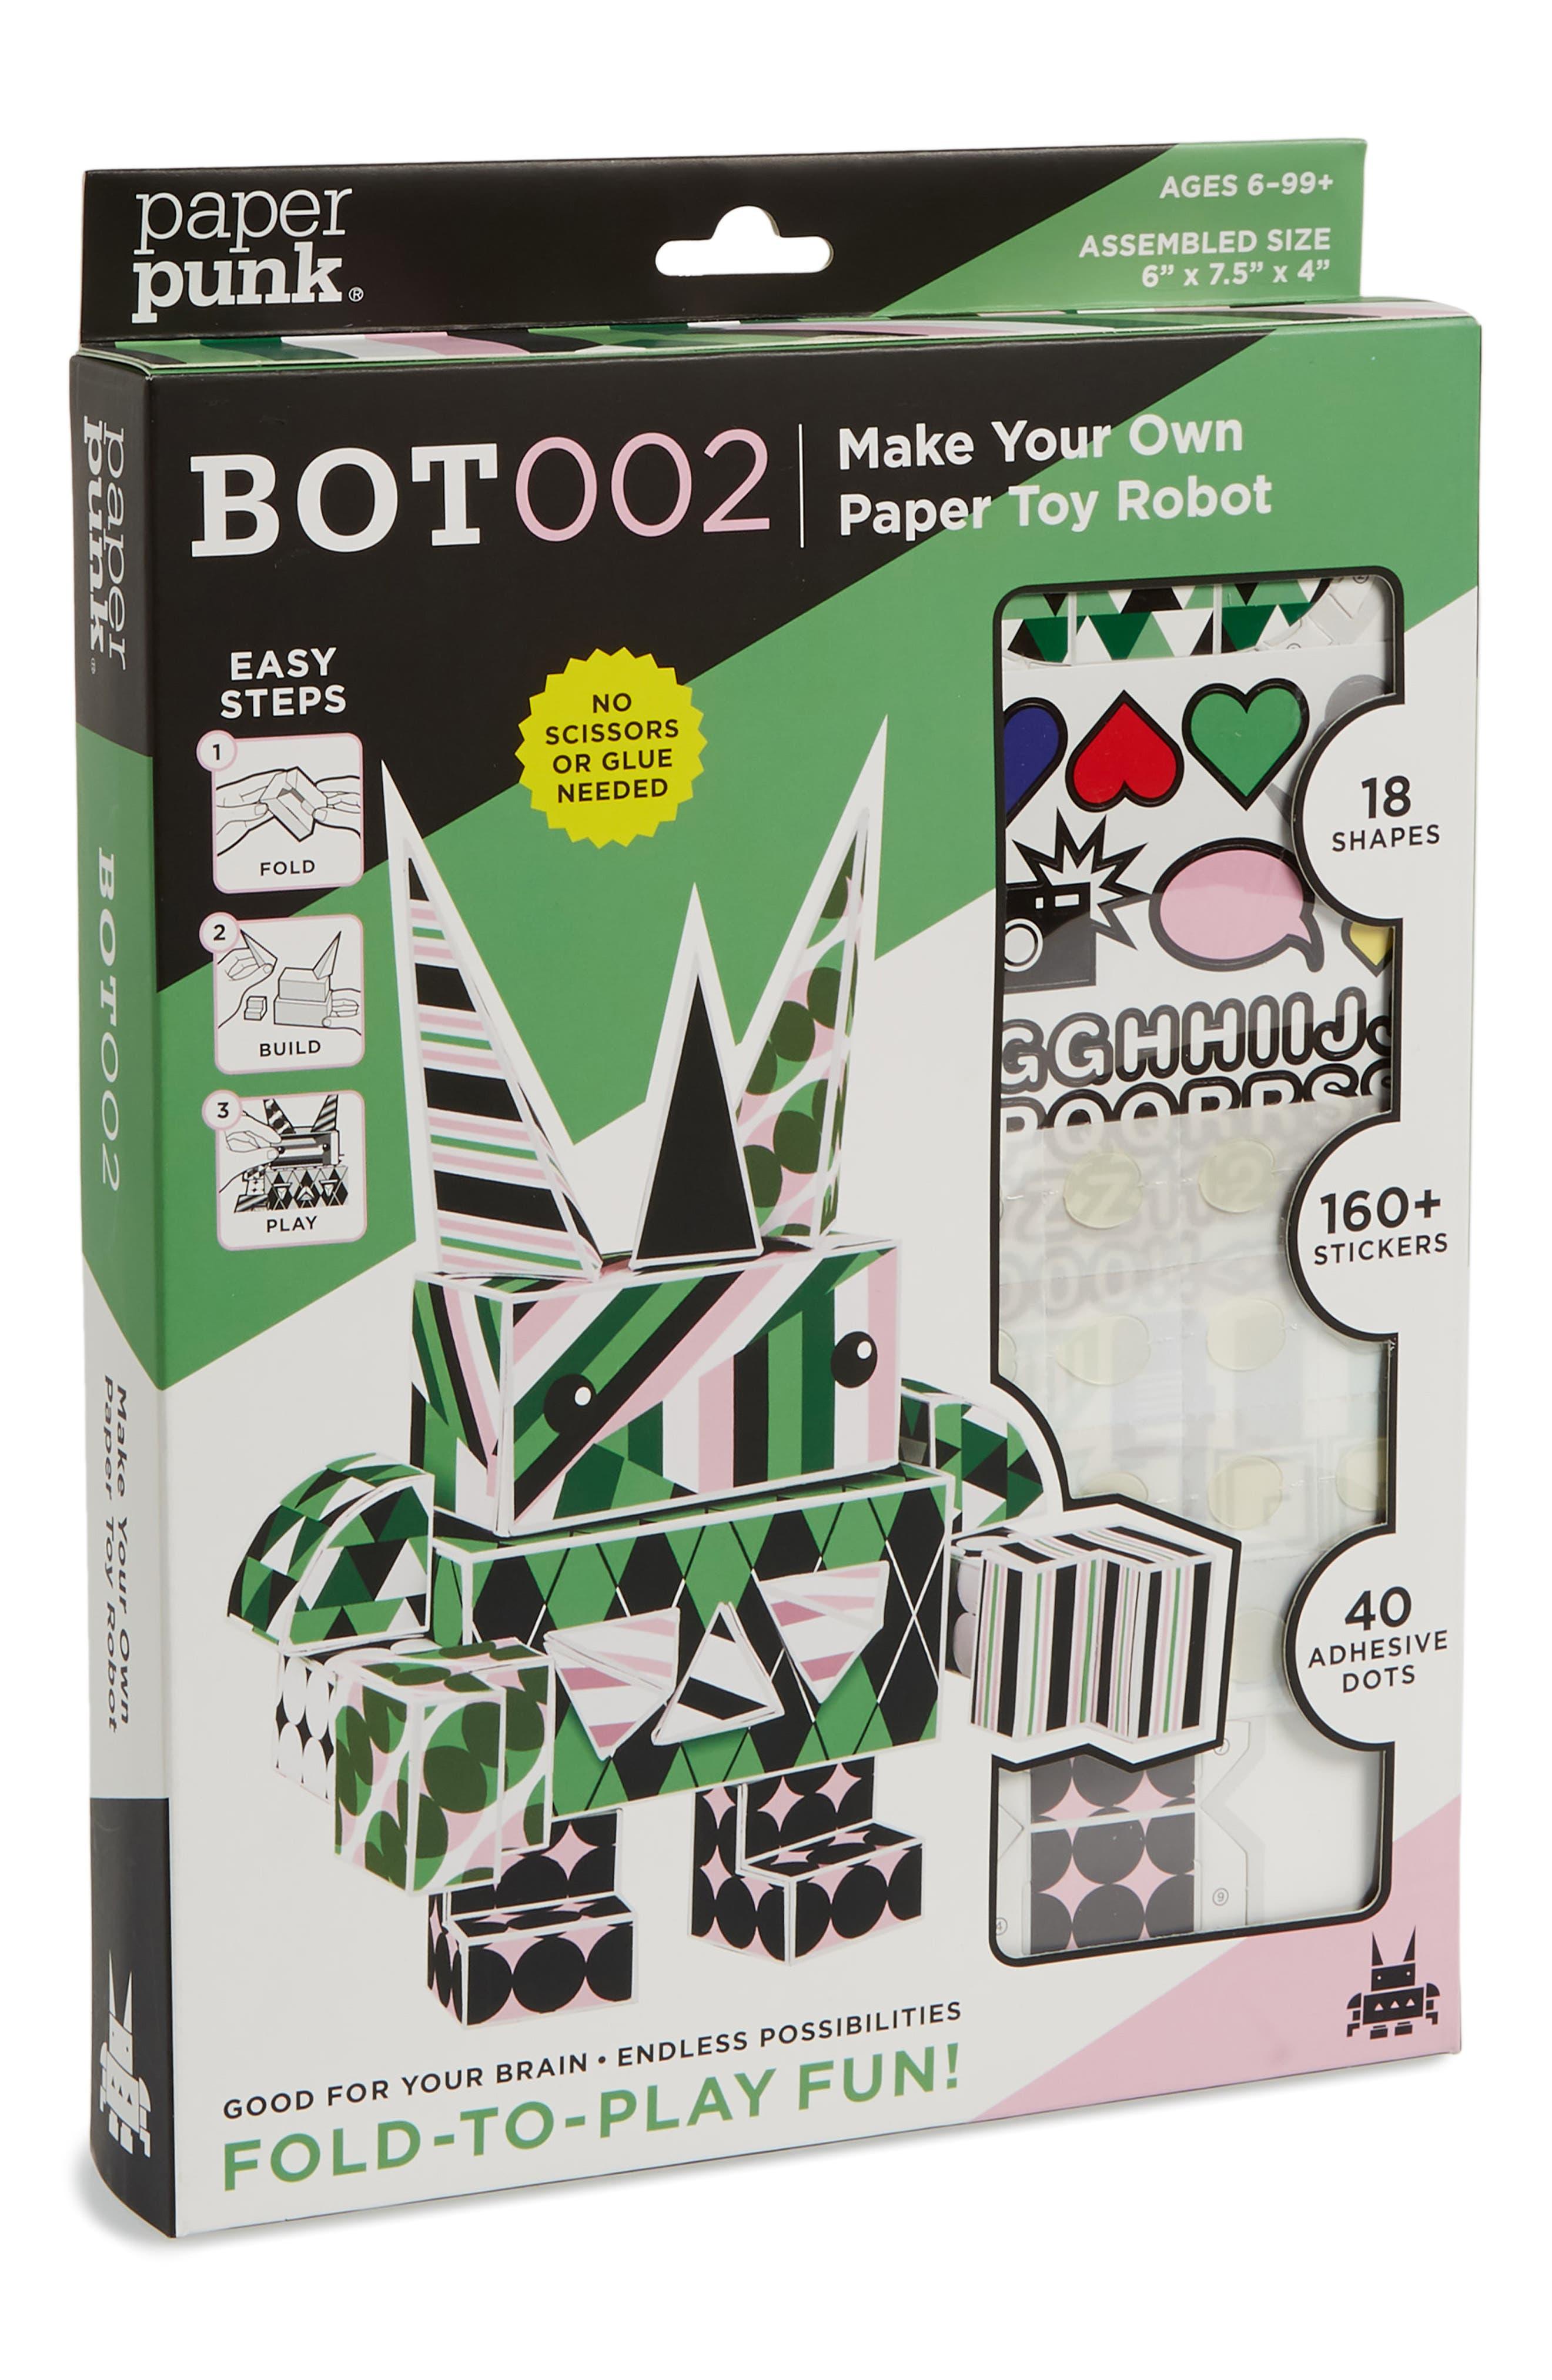 Paper Punk Bot002 Make Your Own Paper Toy Robot Kit